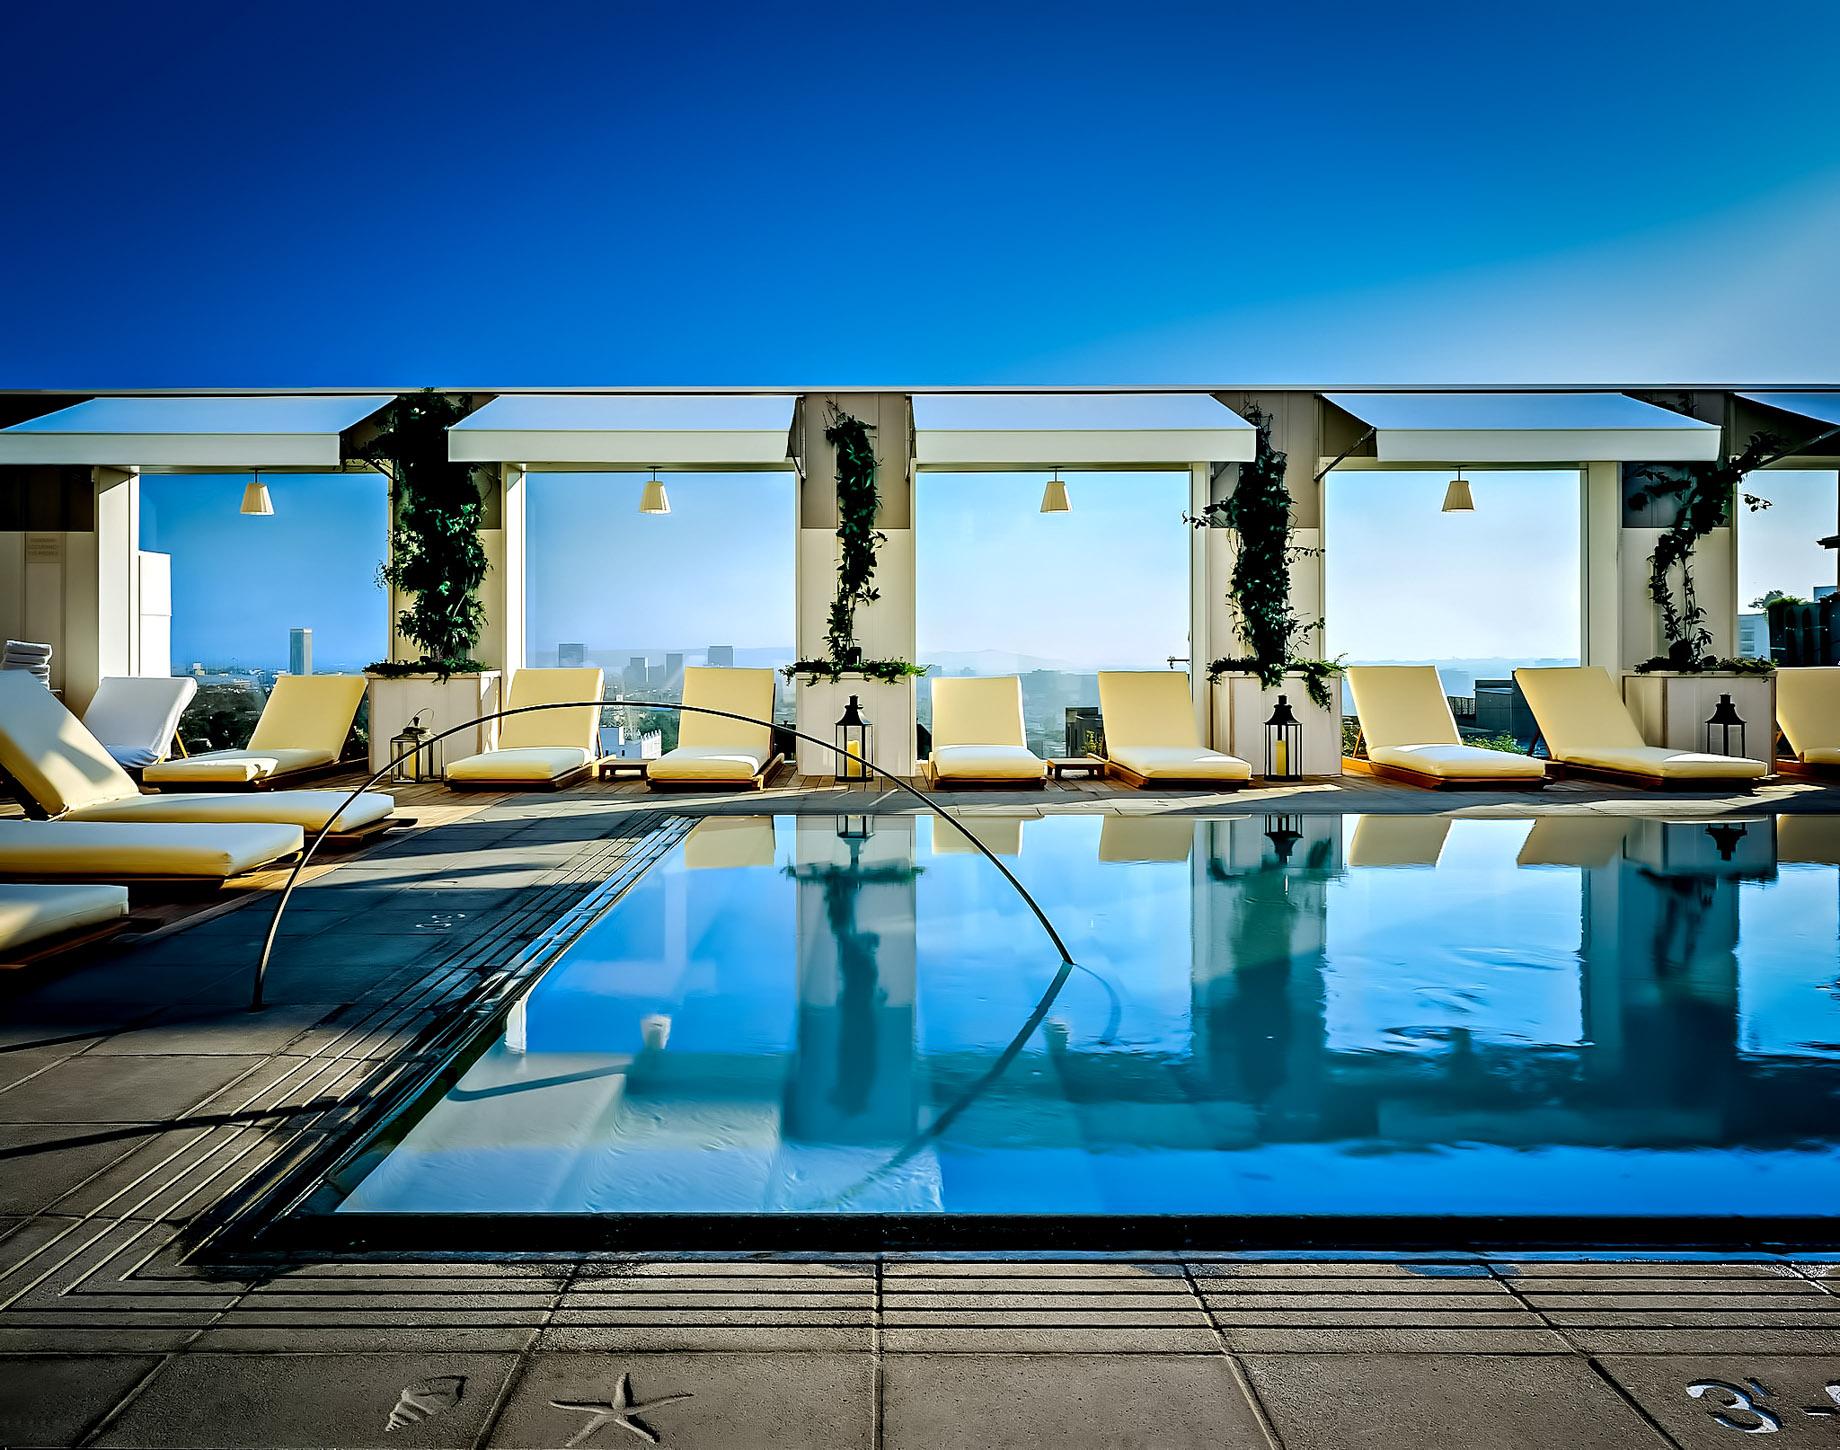 Mondrian Los Angeles Hotel Skybar Rooftop Pool